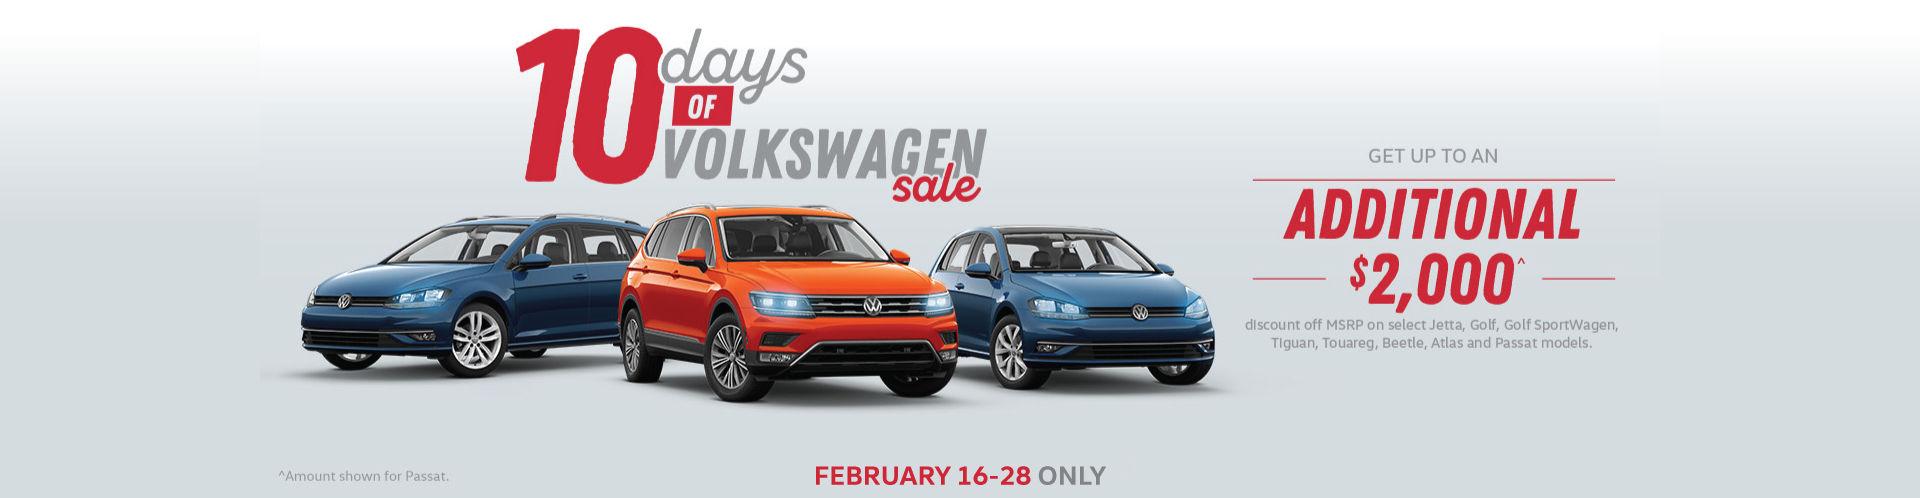 Volkswagen 10-Day Sale Teaser